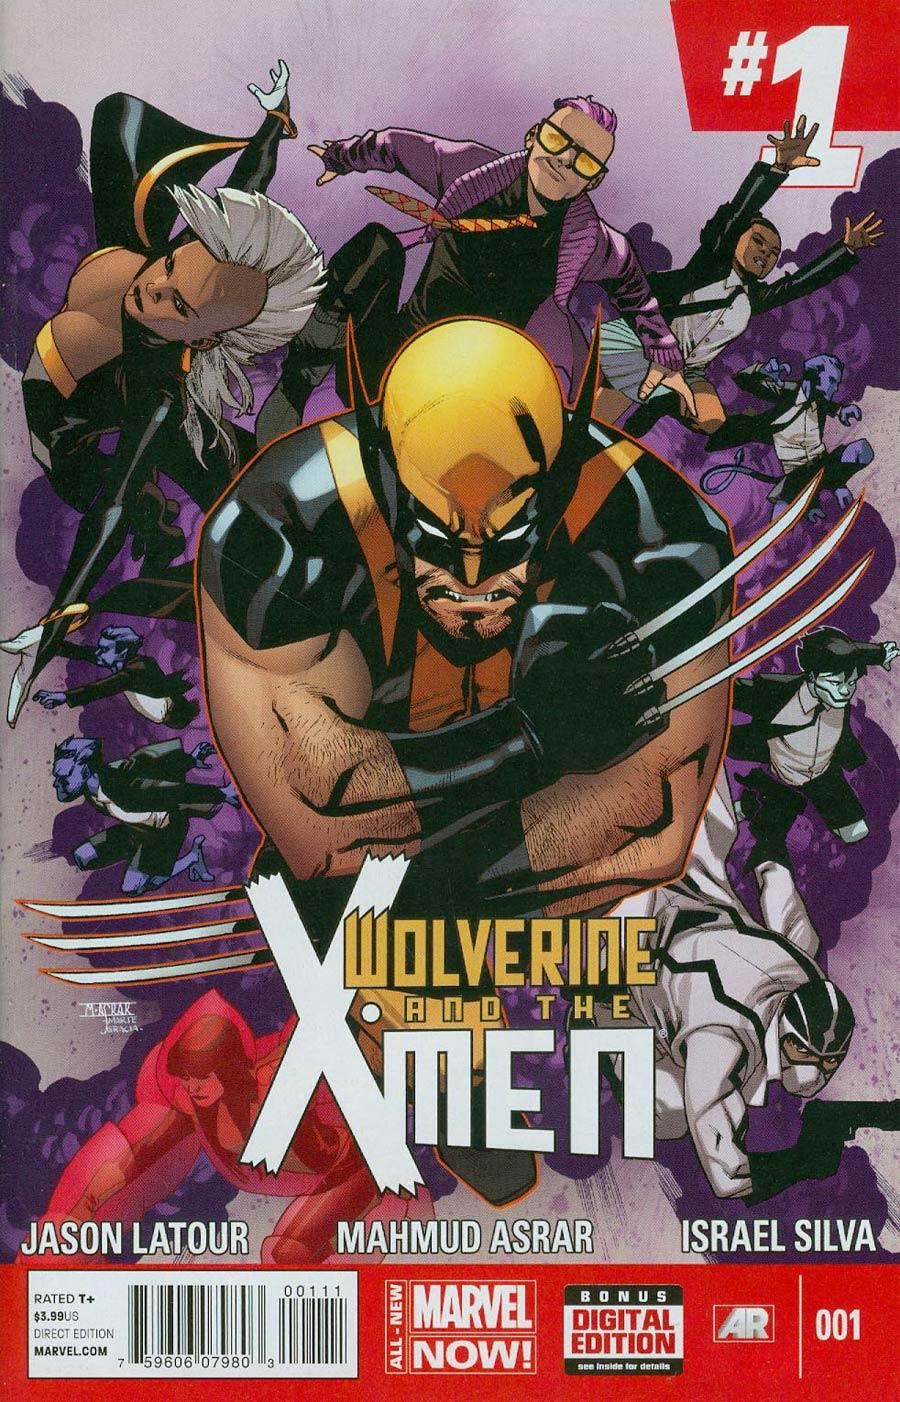 Wolverine And The X-Men Vol 2 #1 Cover A Regular Mahmud Asrar Cover